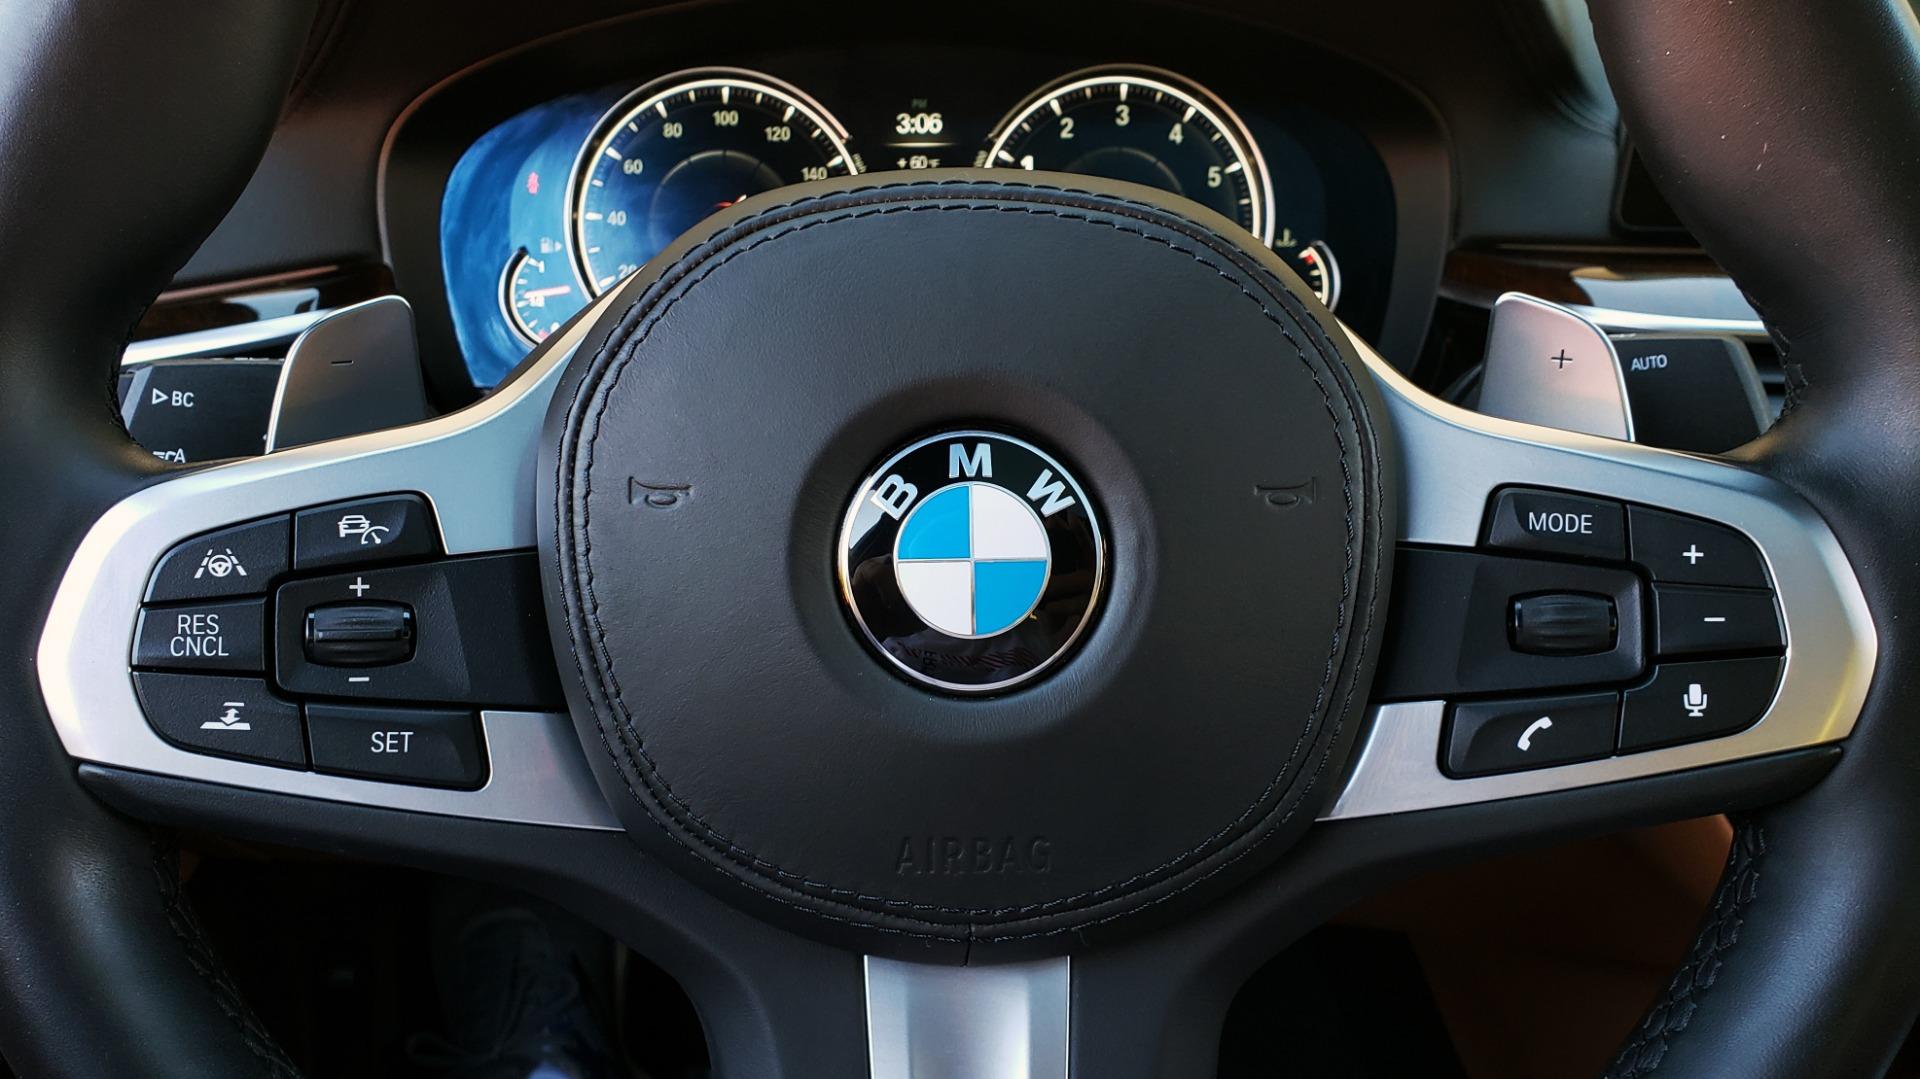 Used 2018 BMW 5 SERIES 540I M-SPORT / DRVR ASST / EXEC PKG / NAV / SUNROOF / HUD / REARVIEW for sale Sold at Formula Imports in Charlotte NC 28227 42